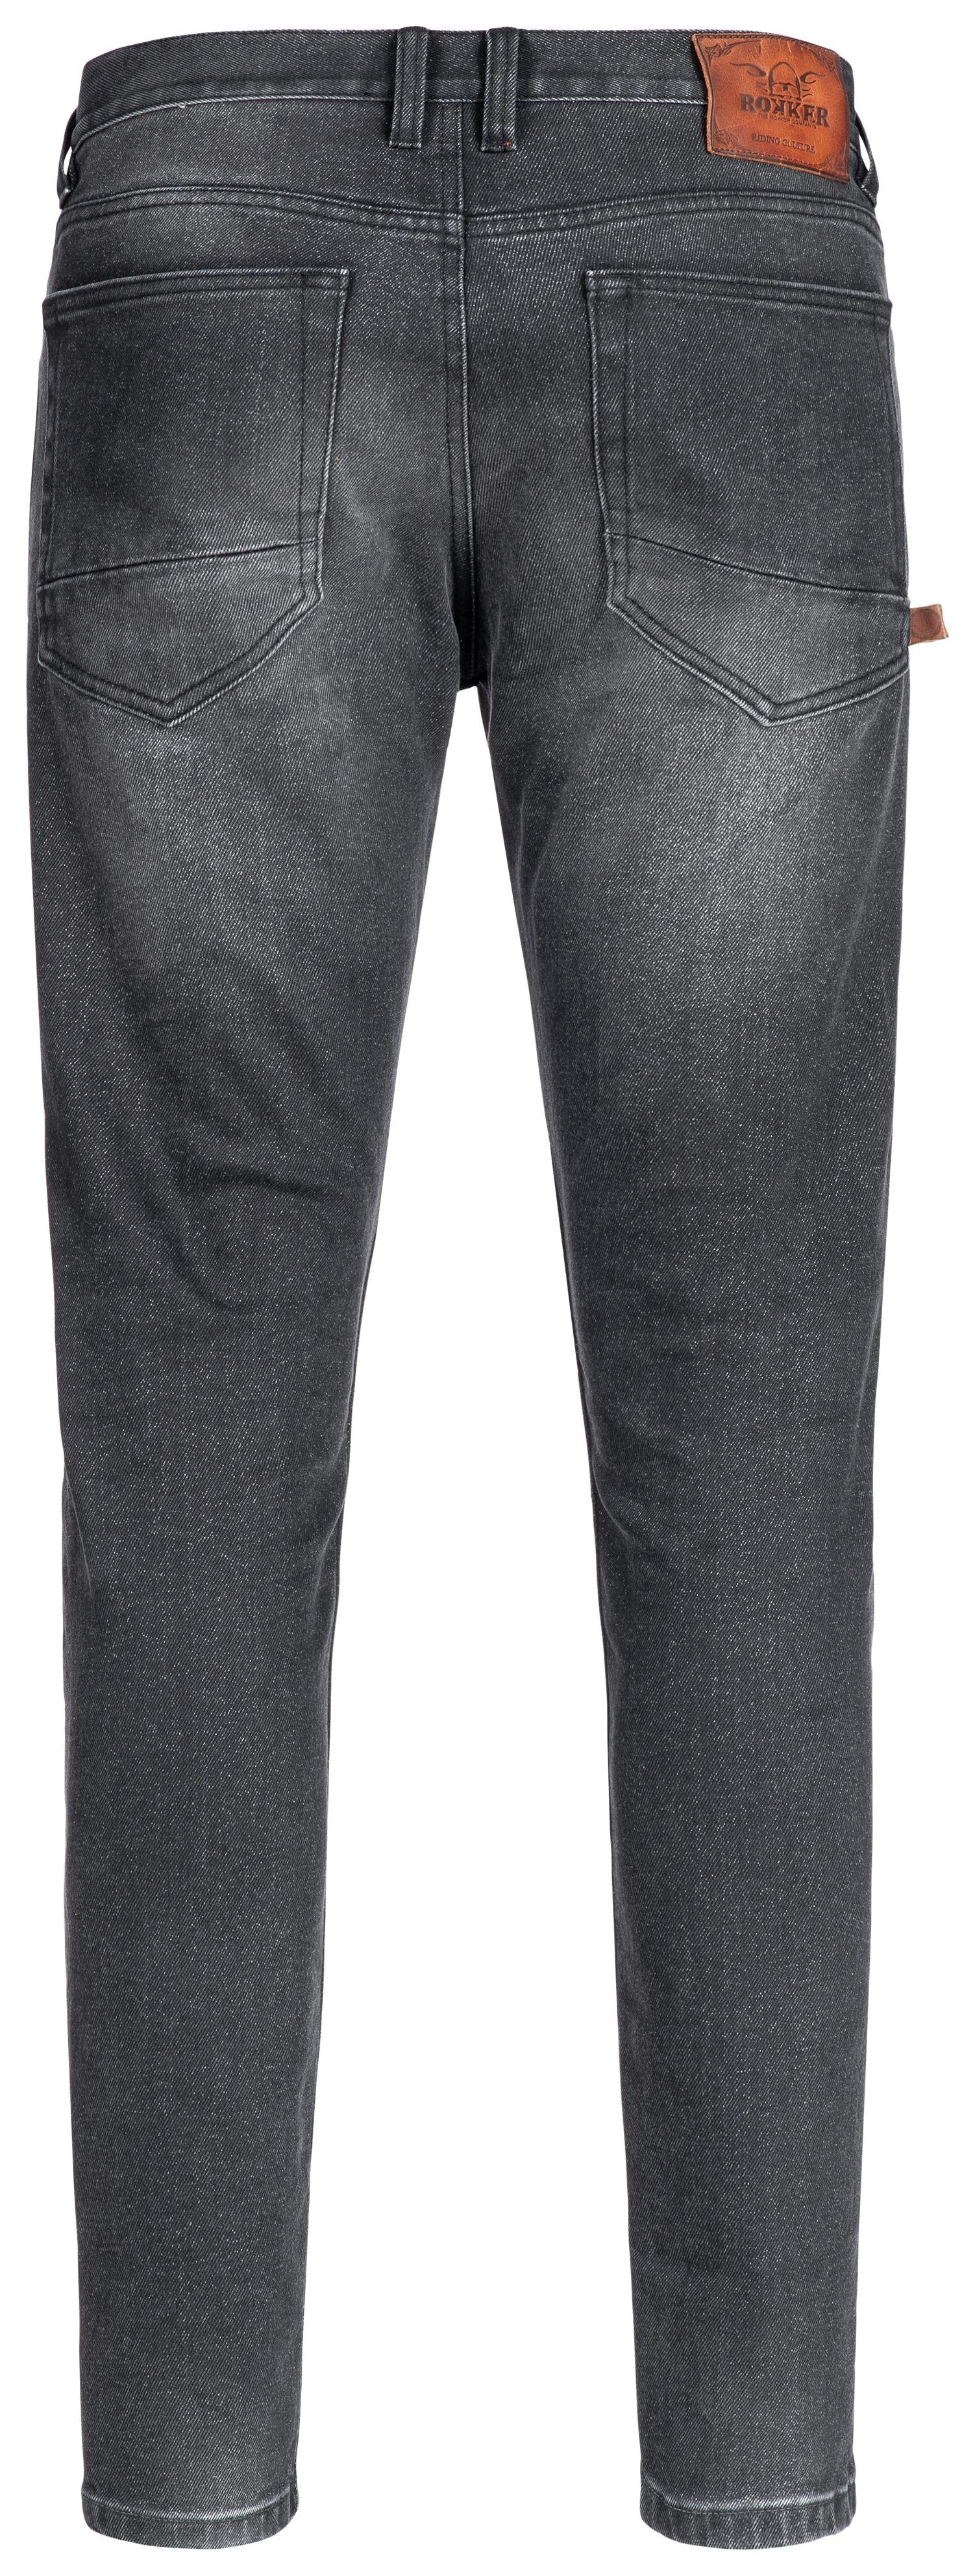 c77c91e0ed5 Rokker RokkerTech Super Slim Jeans - RevZilla